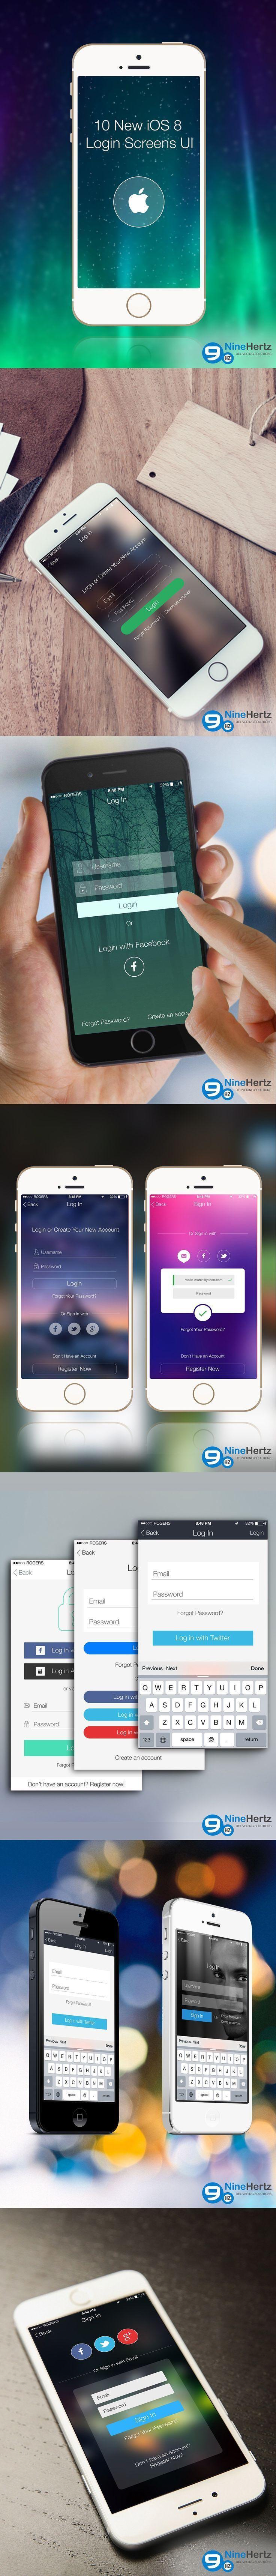 10-New-iOS-8-Login-Screen-UI-Designs